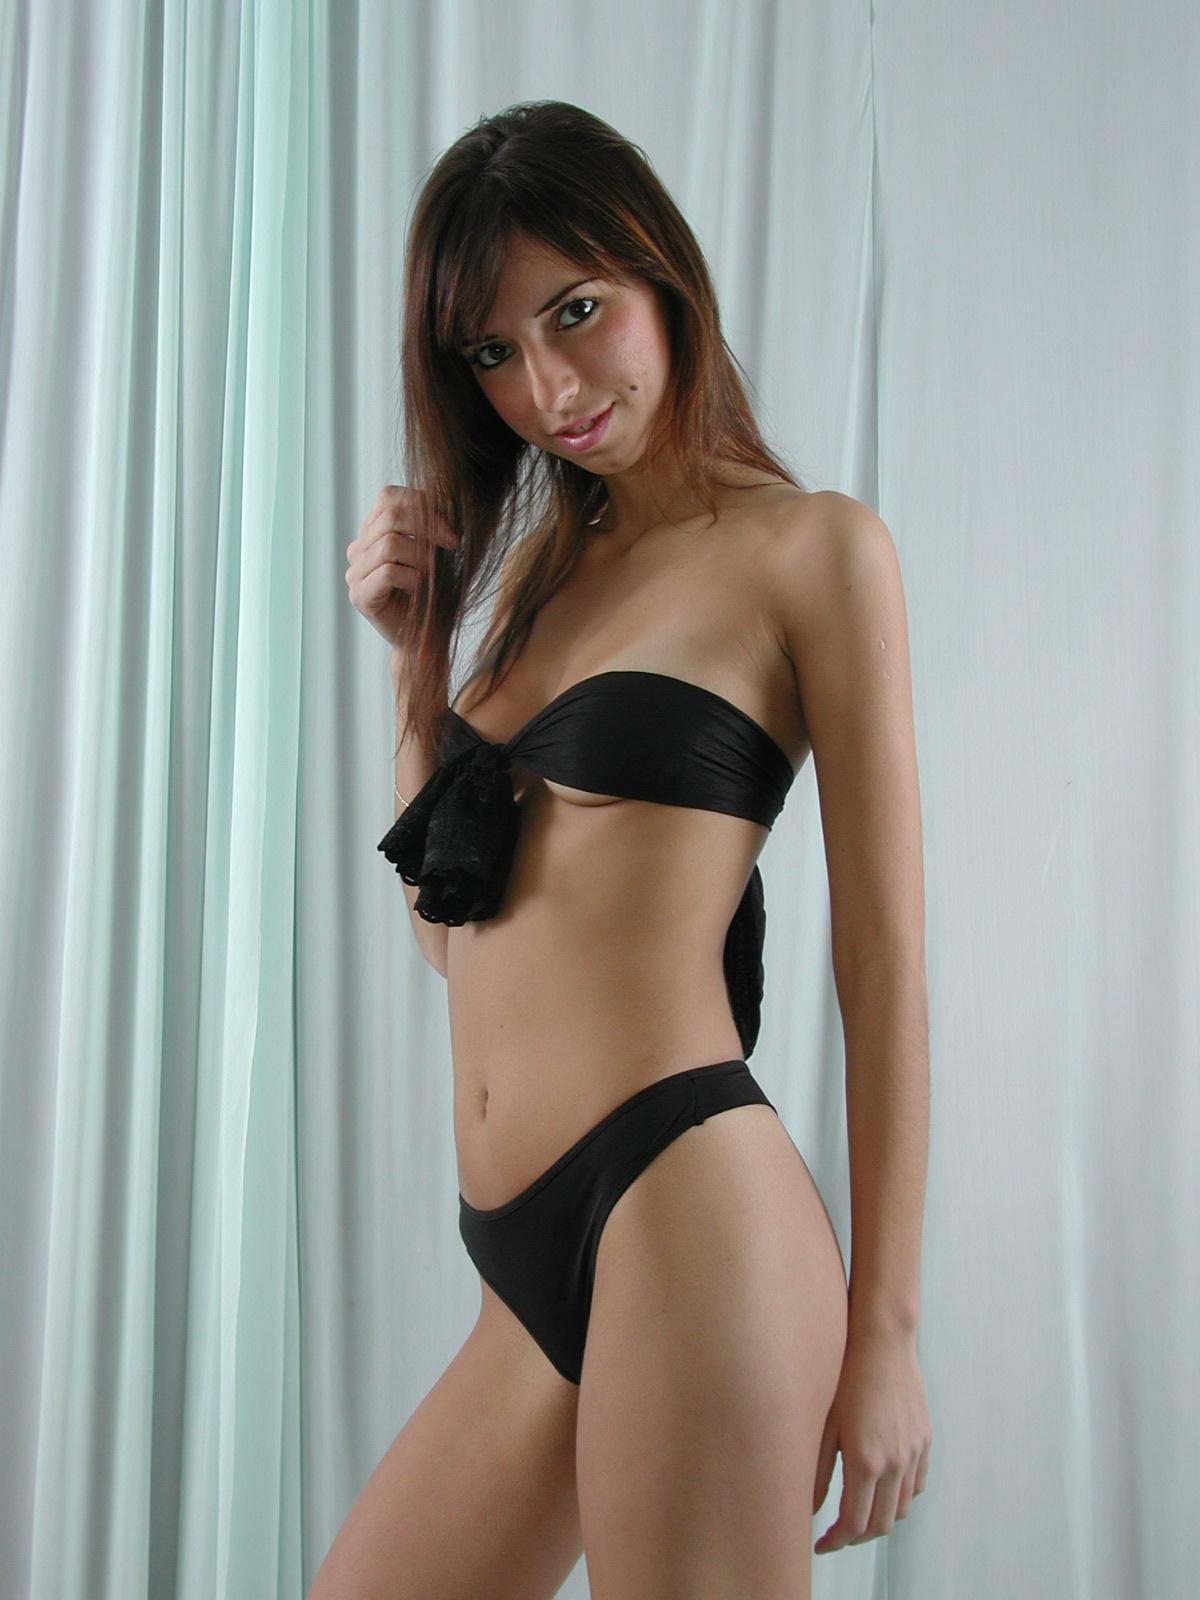 Pantyhose Stocking Lingerie Vladmodel Topless Set